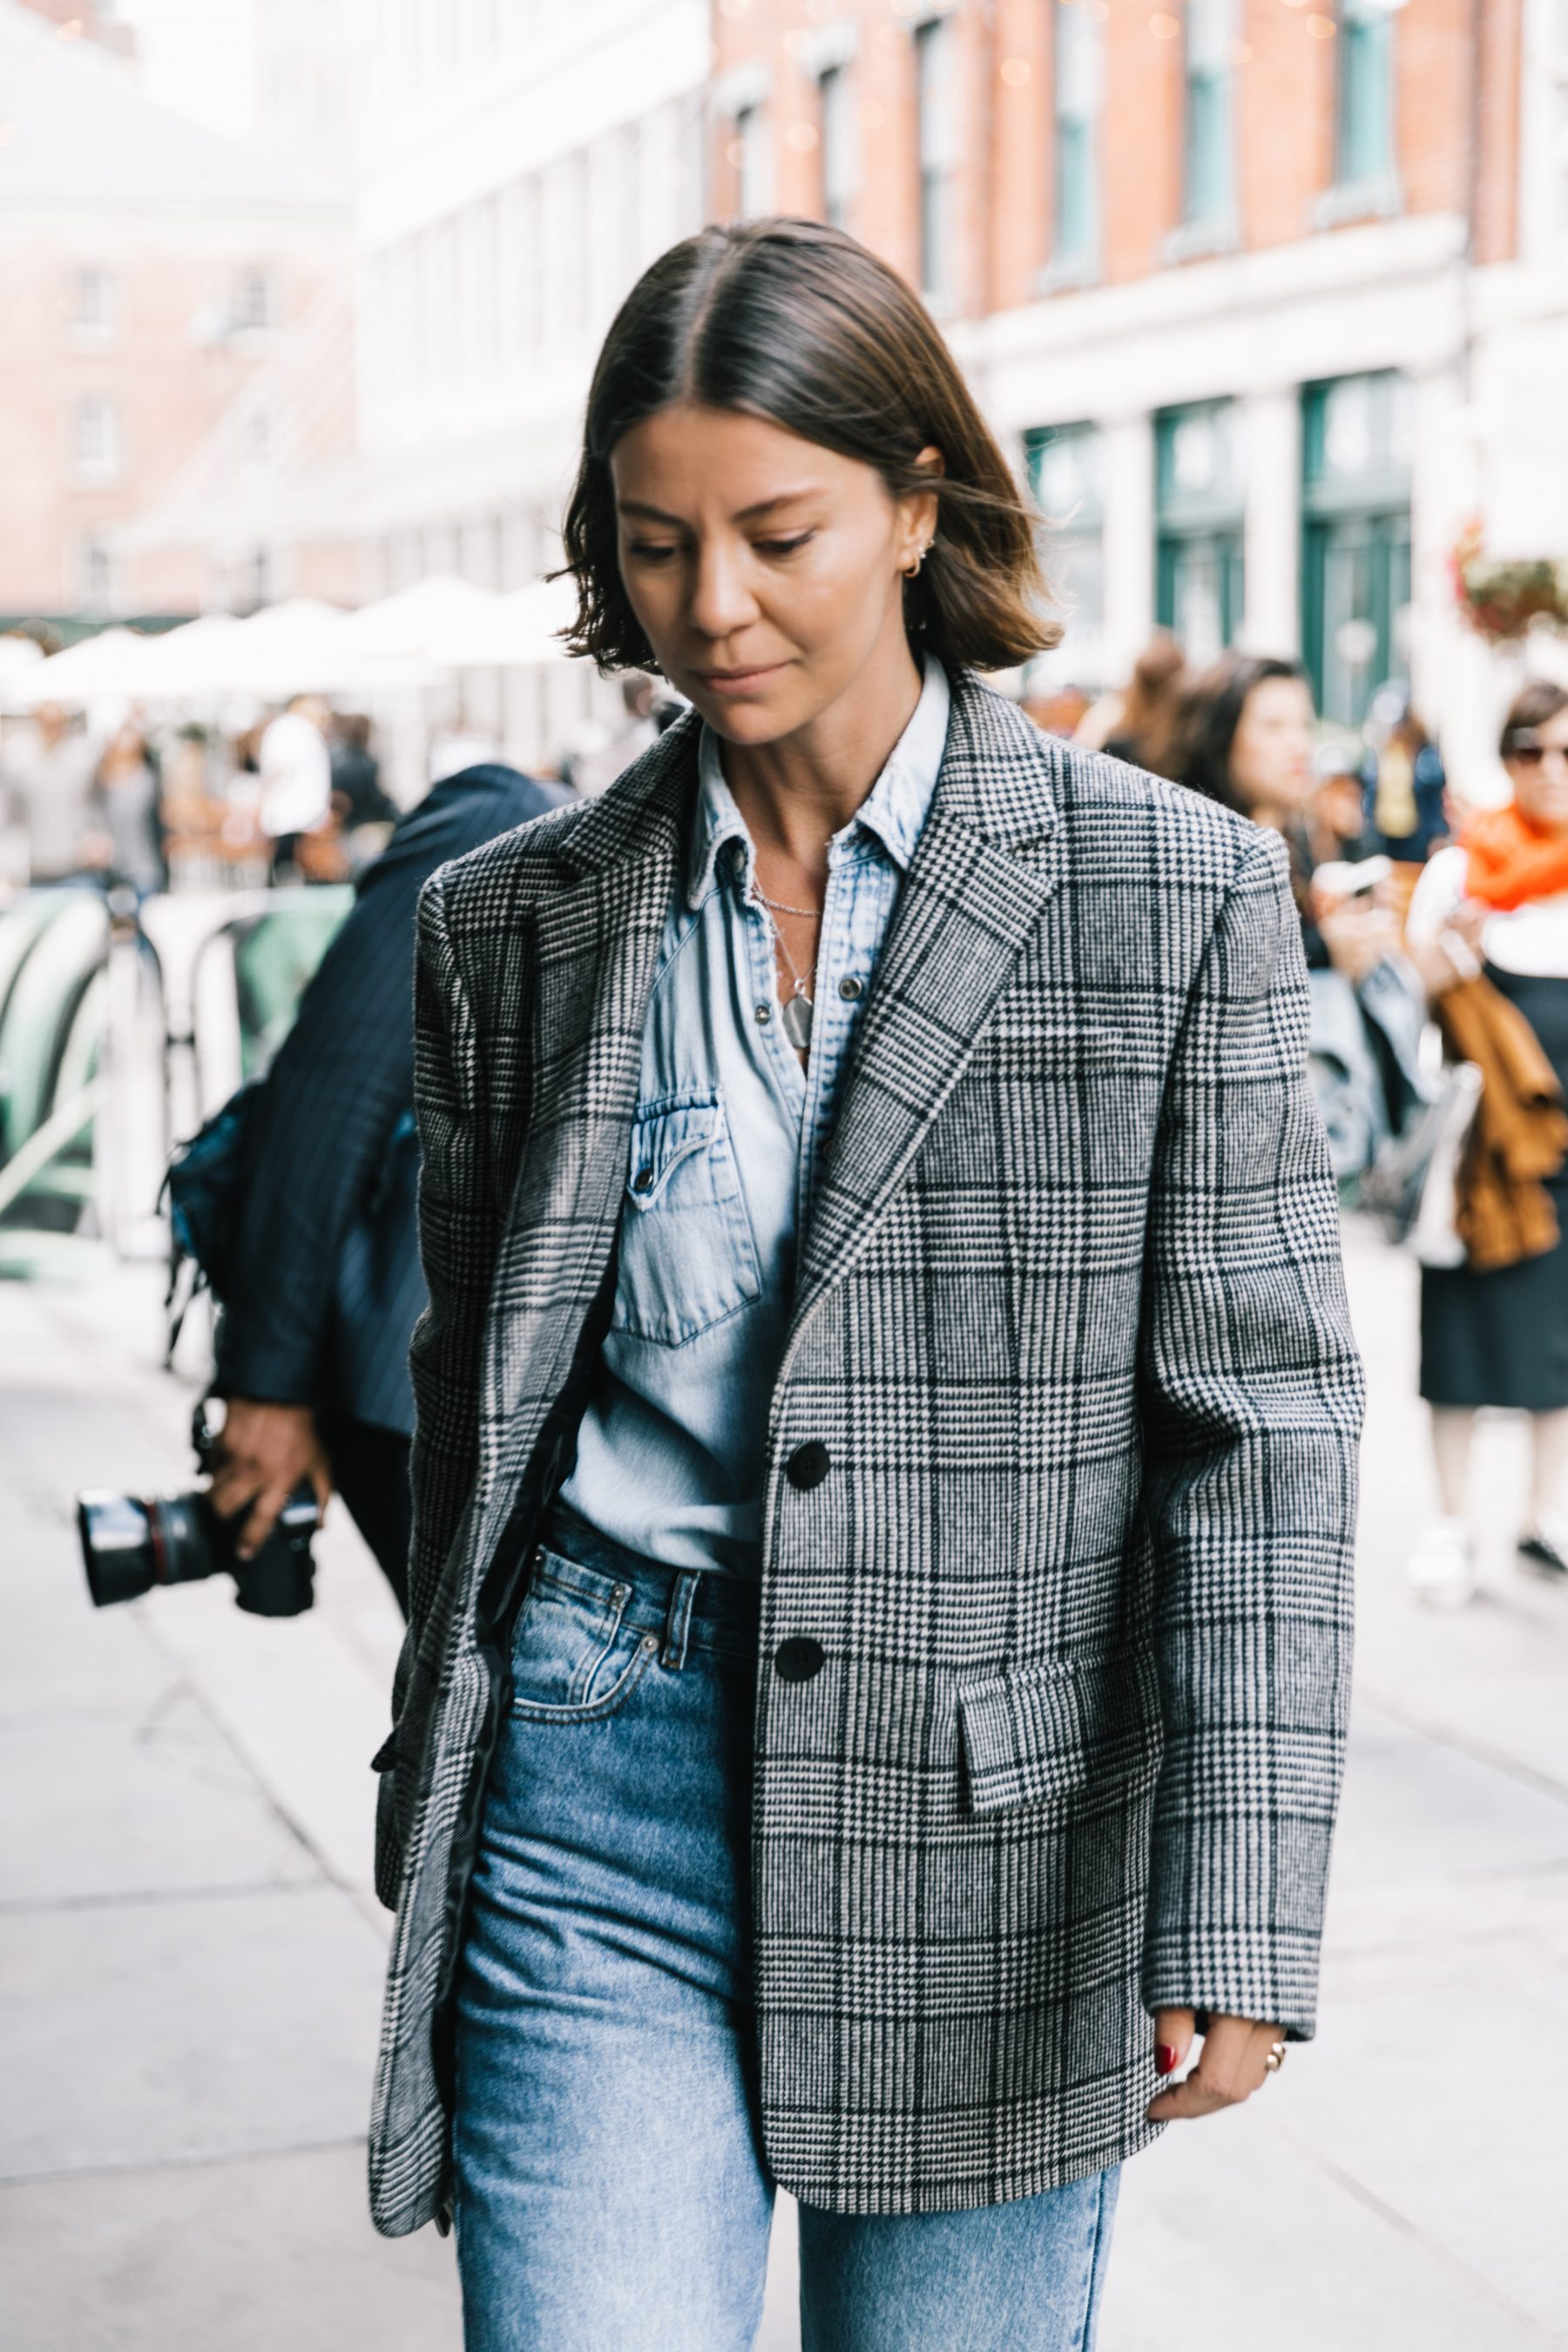 NYFW-SS18-New_York_Fashion_Week-Street_Style-Vogue-Collage_Vintage-245-1-1800x2700